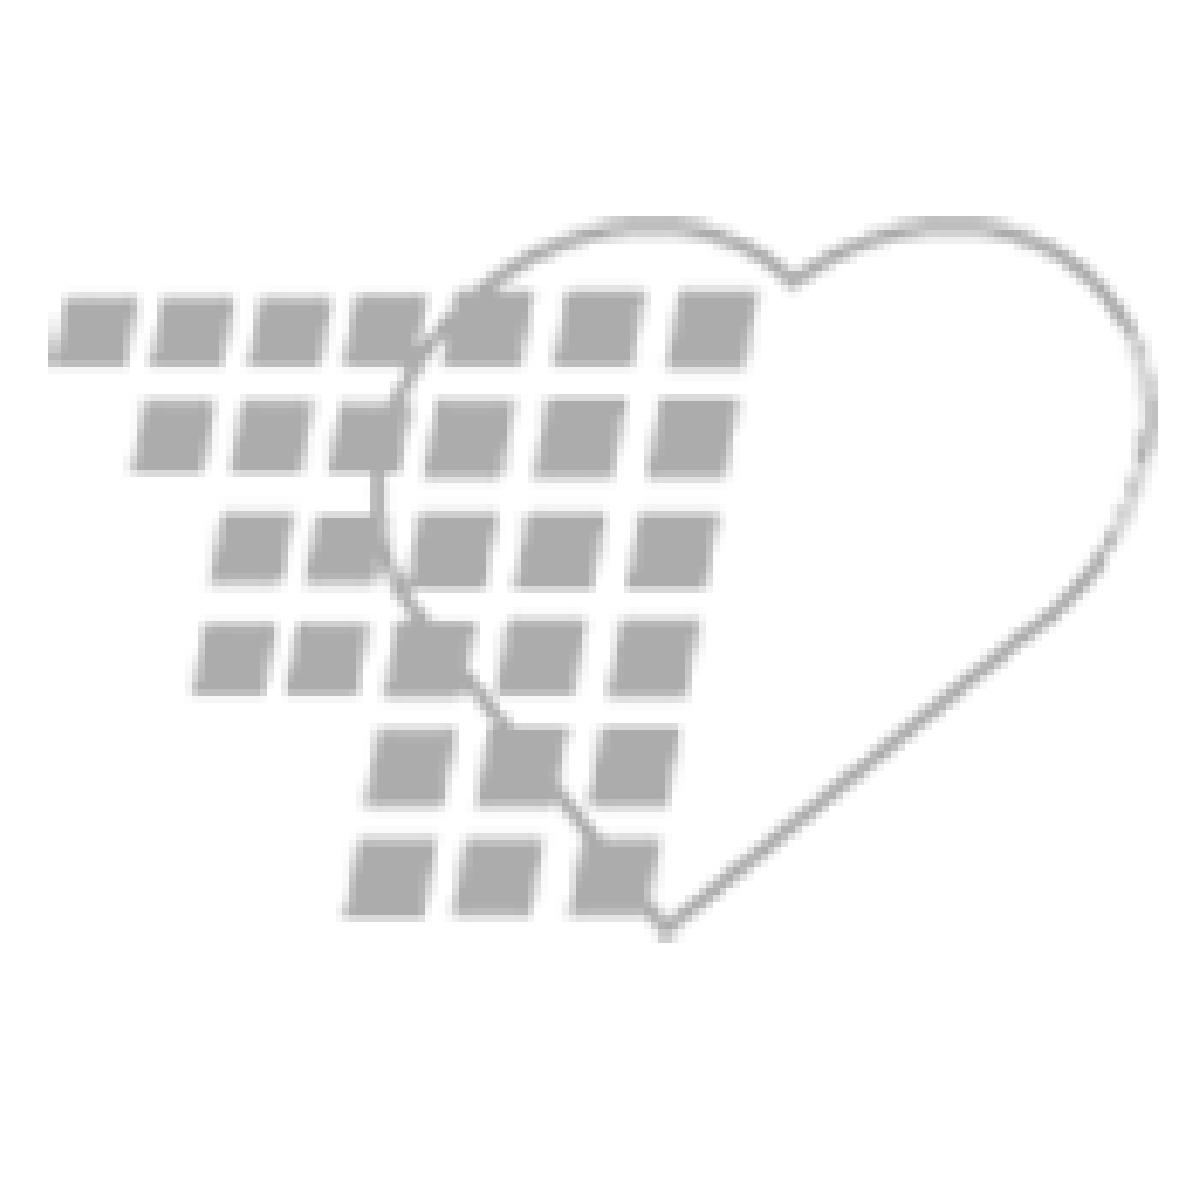 06-93-6921 Demo Dose® Isopreterenl hydrochlorid (Isoprl) 0.2mg/mL 1mL